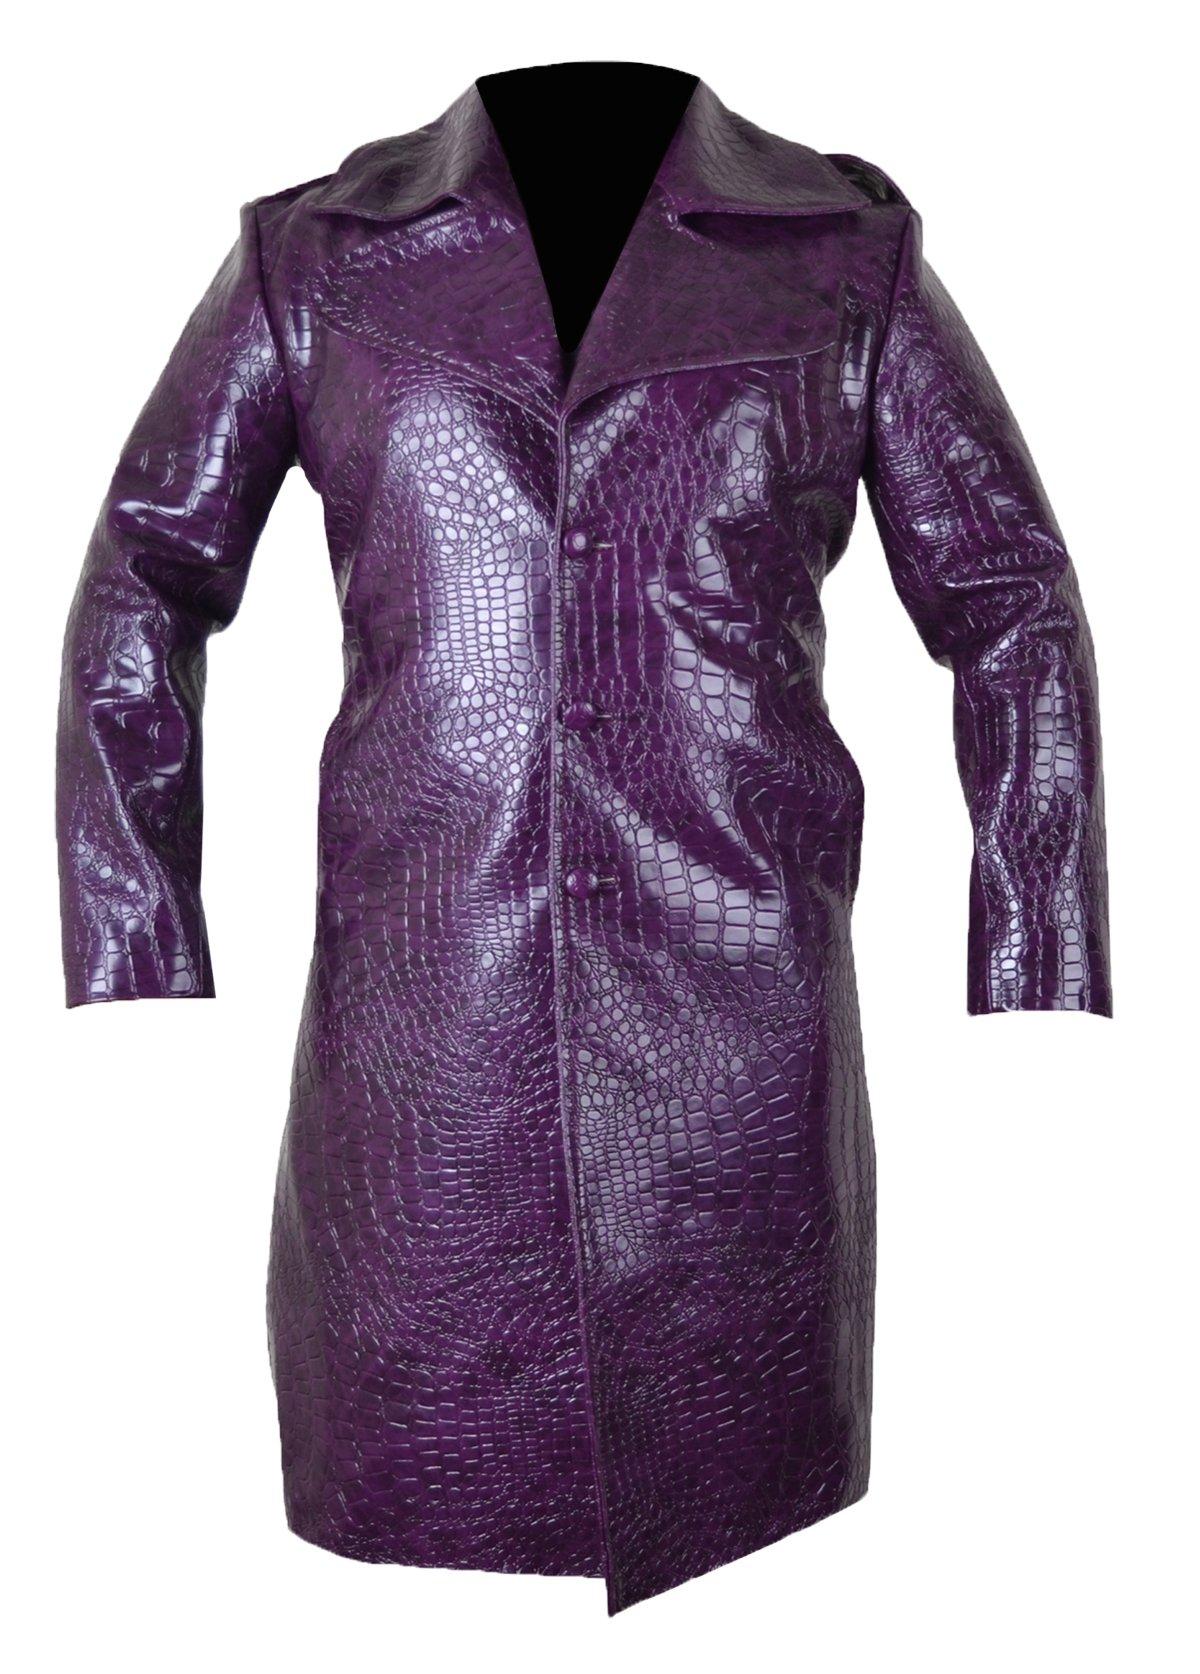 MSHC Joker Jared Leto Purple Coat Suicide Squad Crocodile Pattern Trench Coat (3XL)